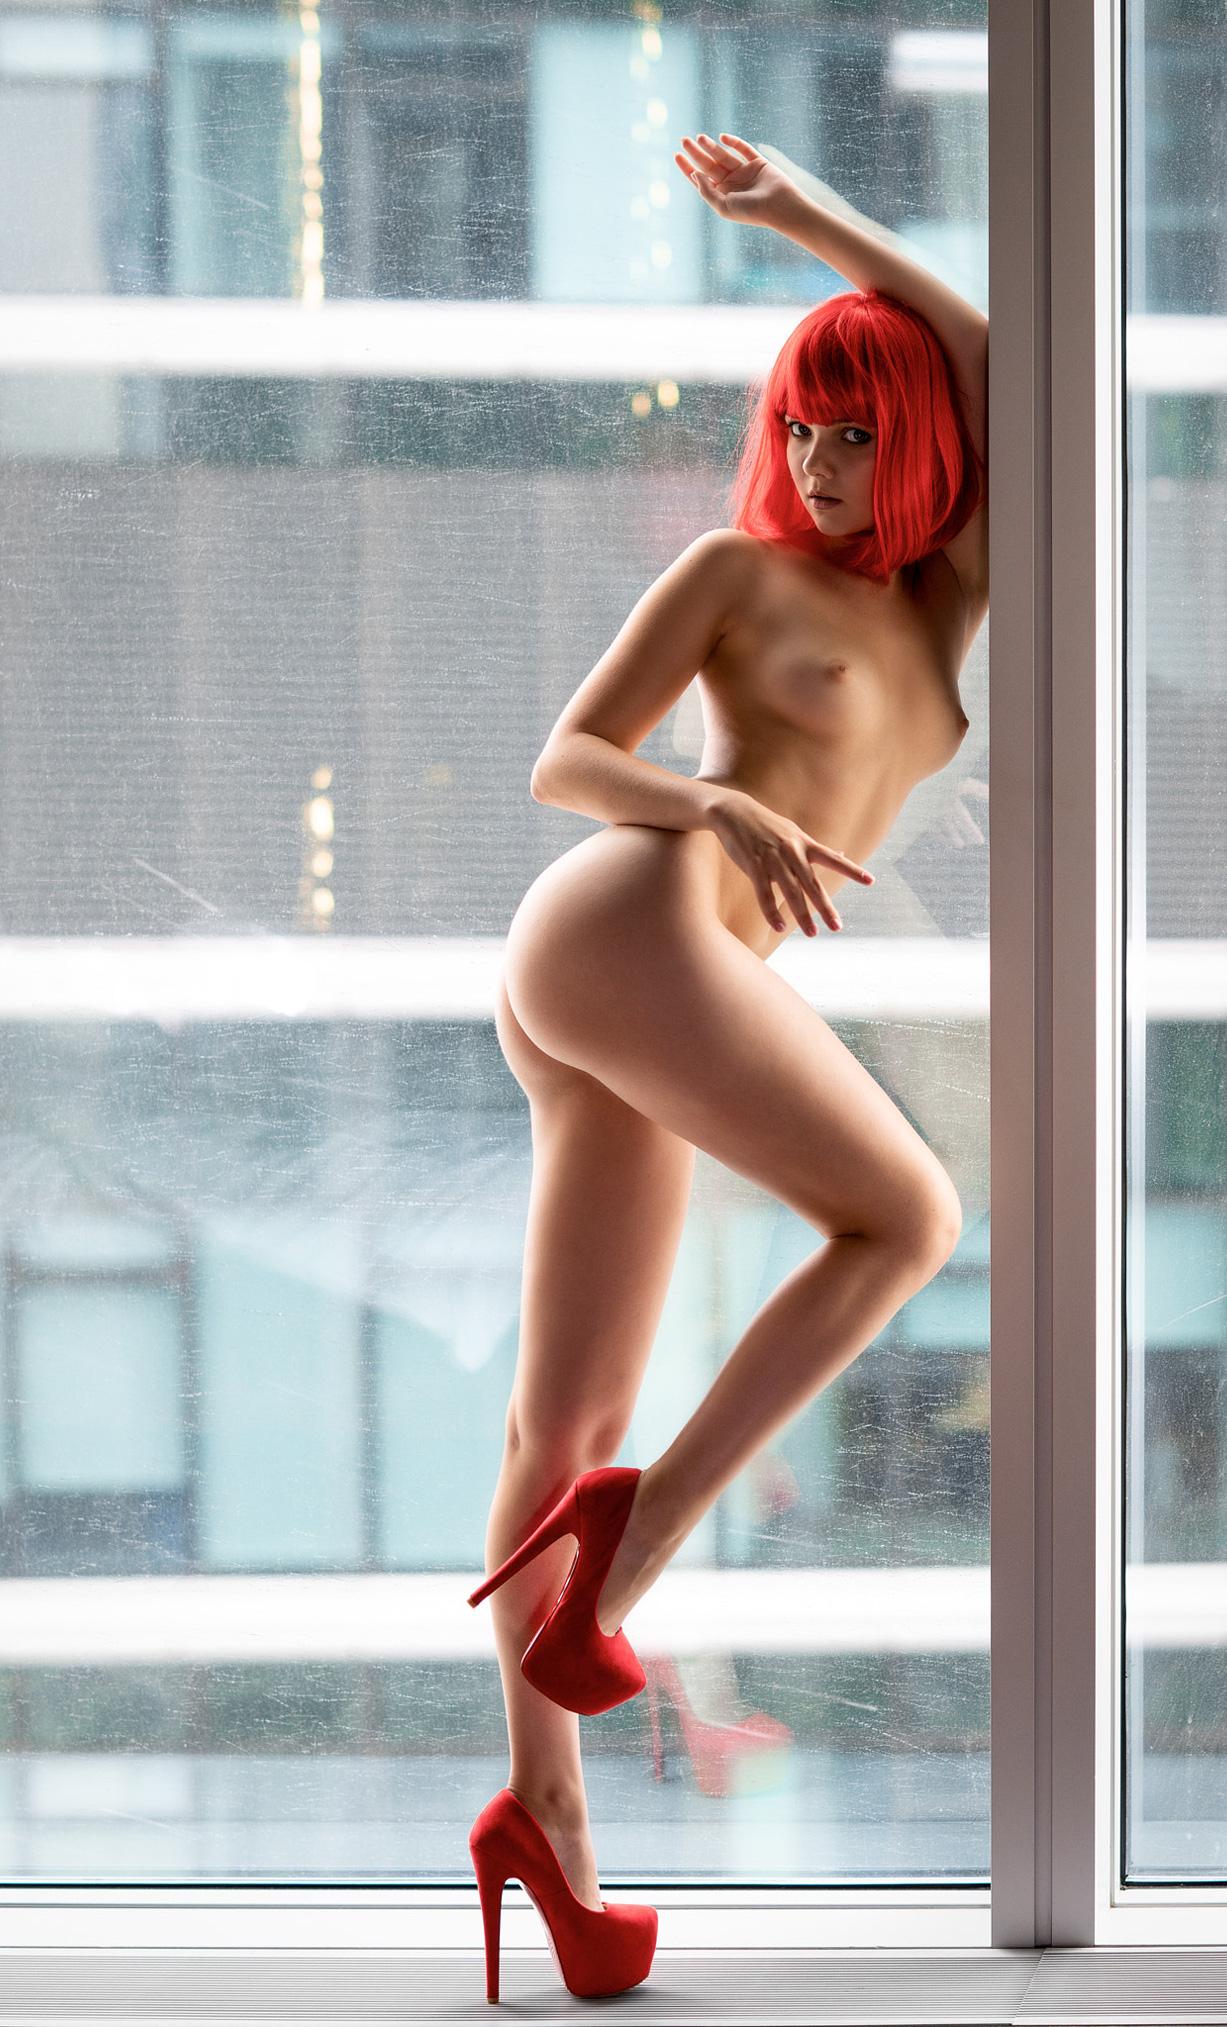 Голая Виктория Соколова у окна смотрит на дождь / Victoria Sokolova nude by Vladimir Nikolaev / Against the Rain